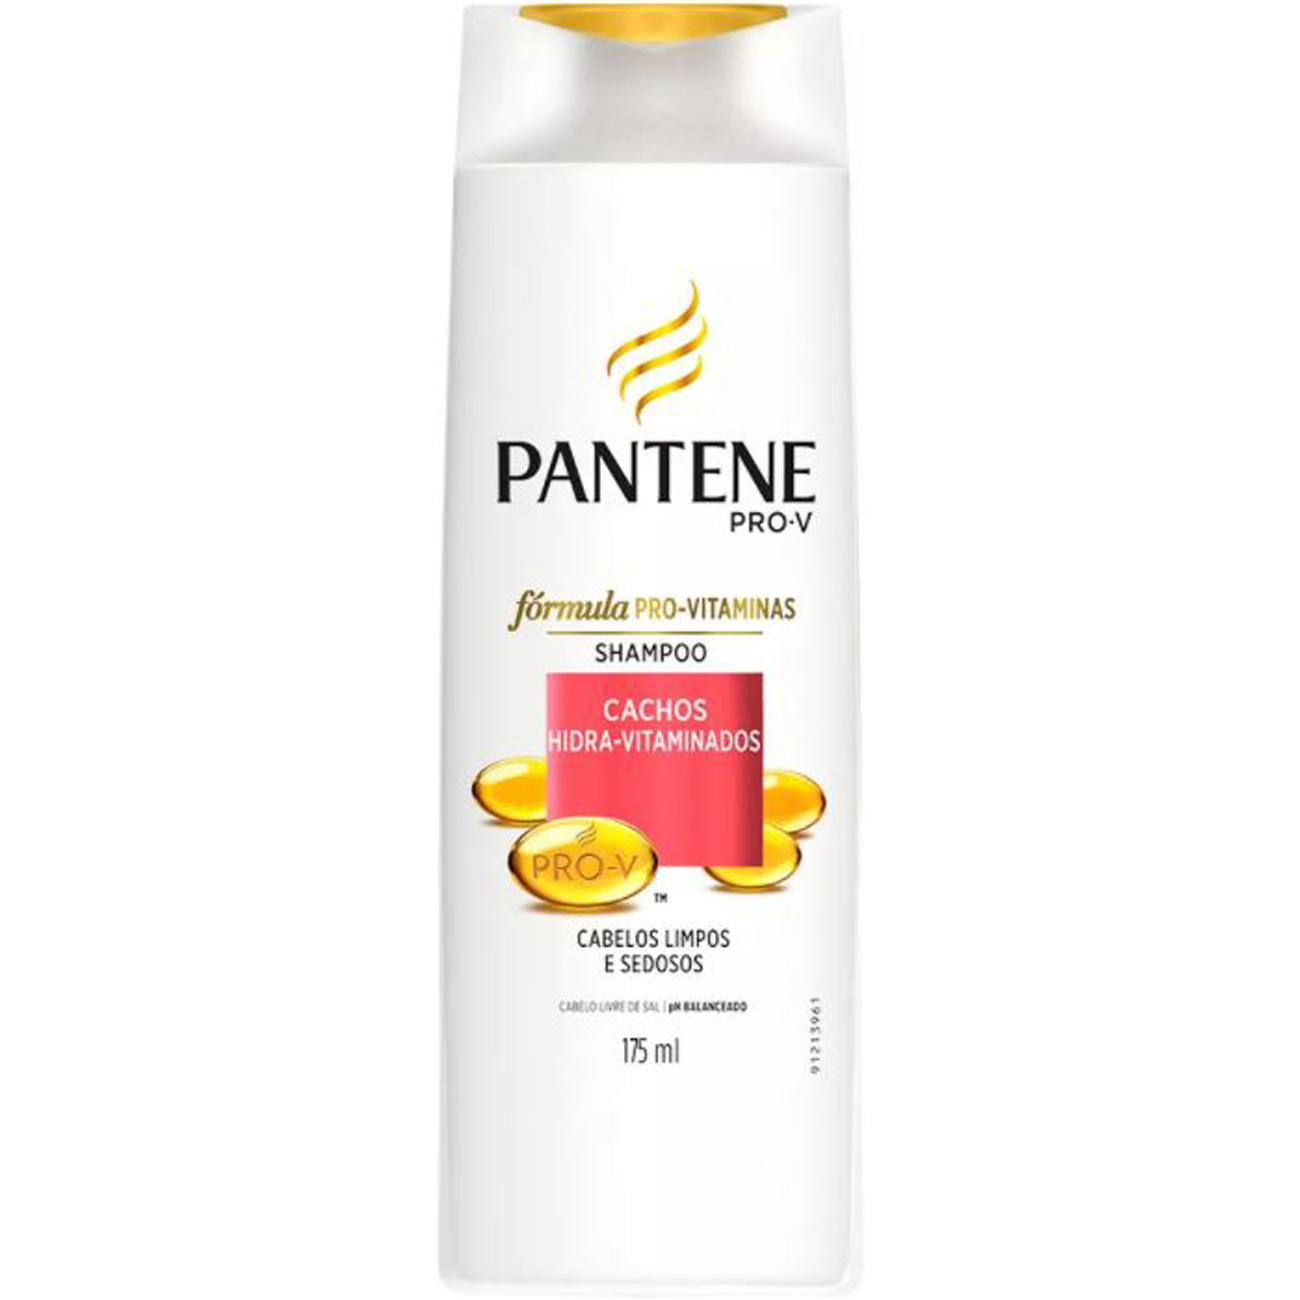 Shampoo Pantene Cachos hidro vitaminados  175 ml